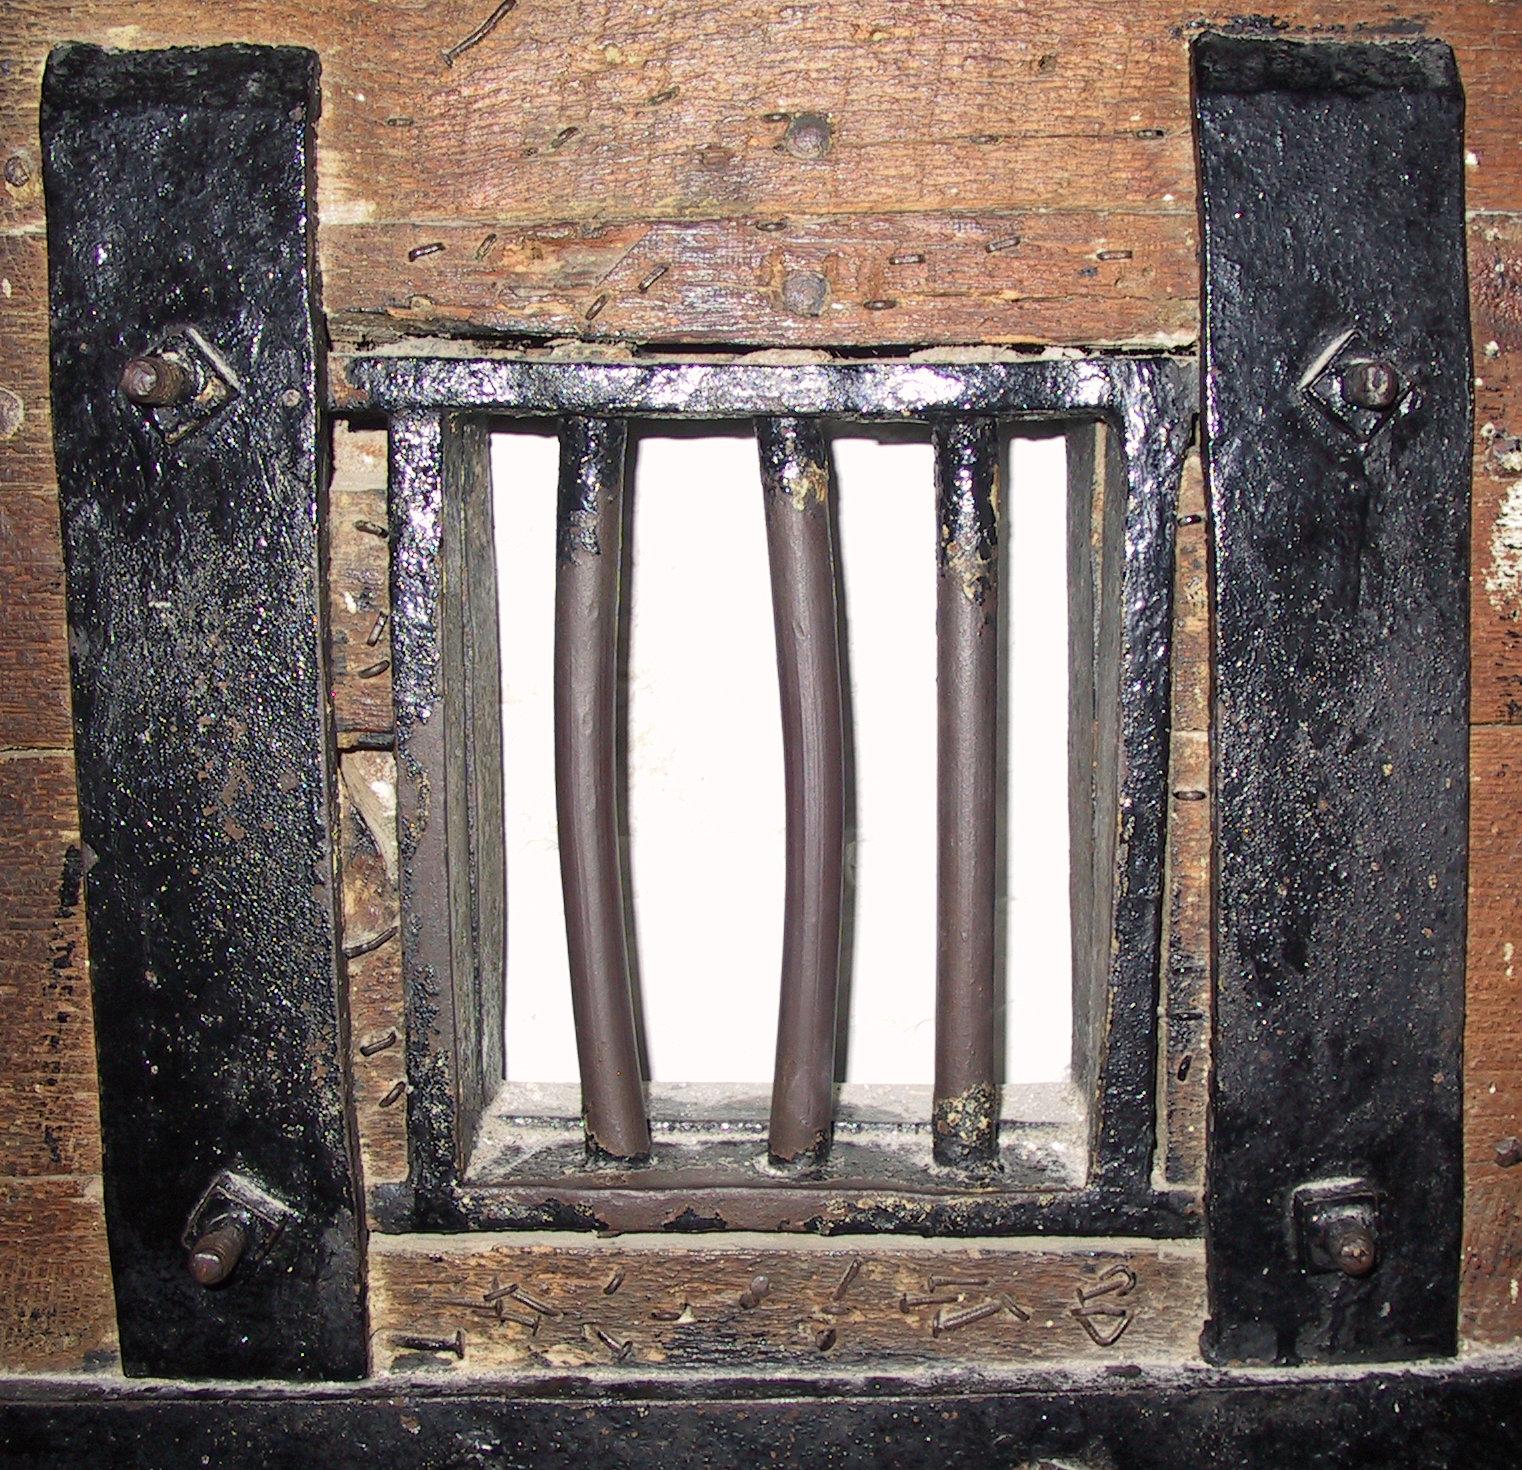 Oklahoma Barred Window by Falln-Stock on DeviantArt